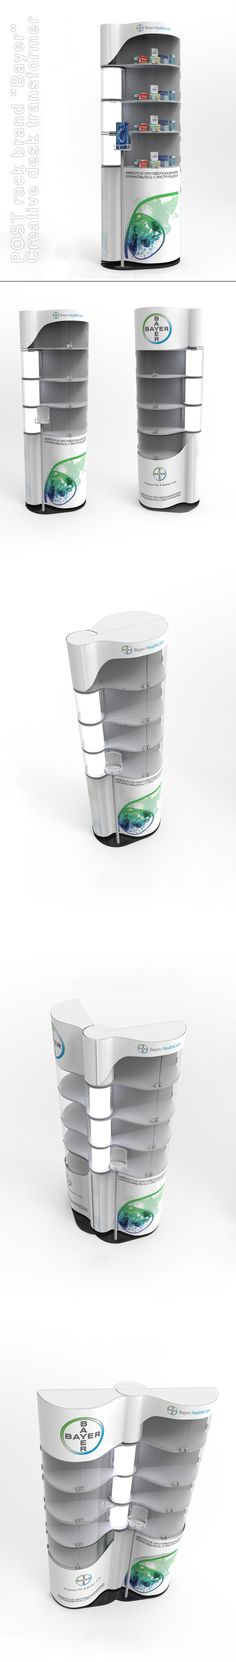 "POSM Design Creative Transforming ""Bayer"""